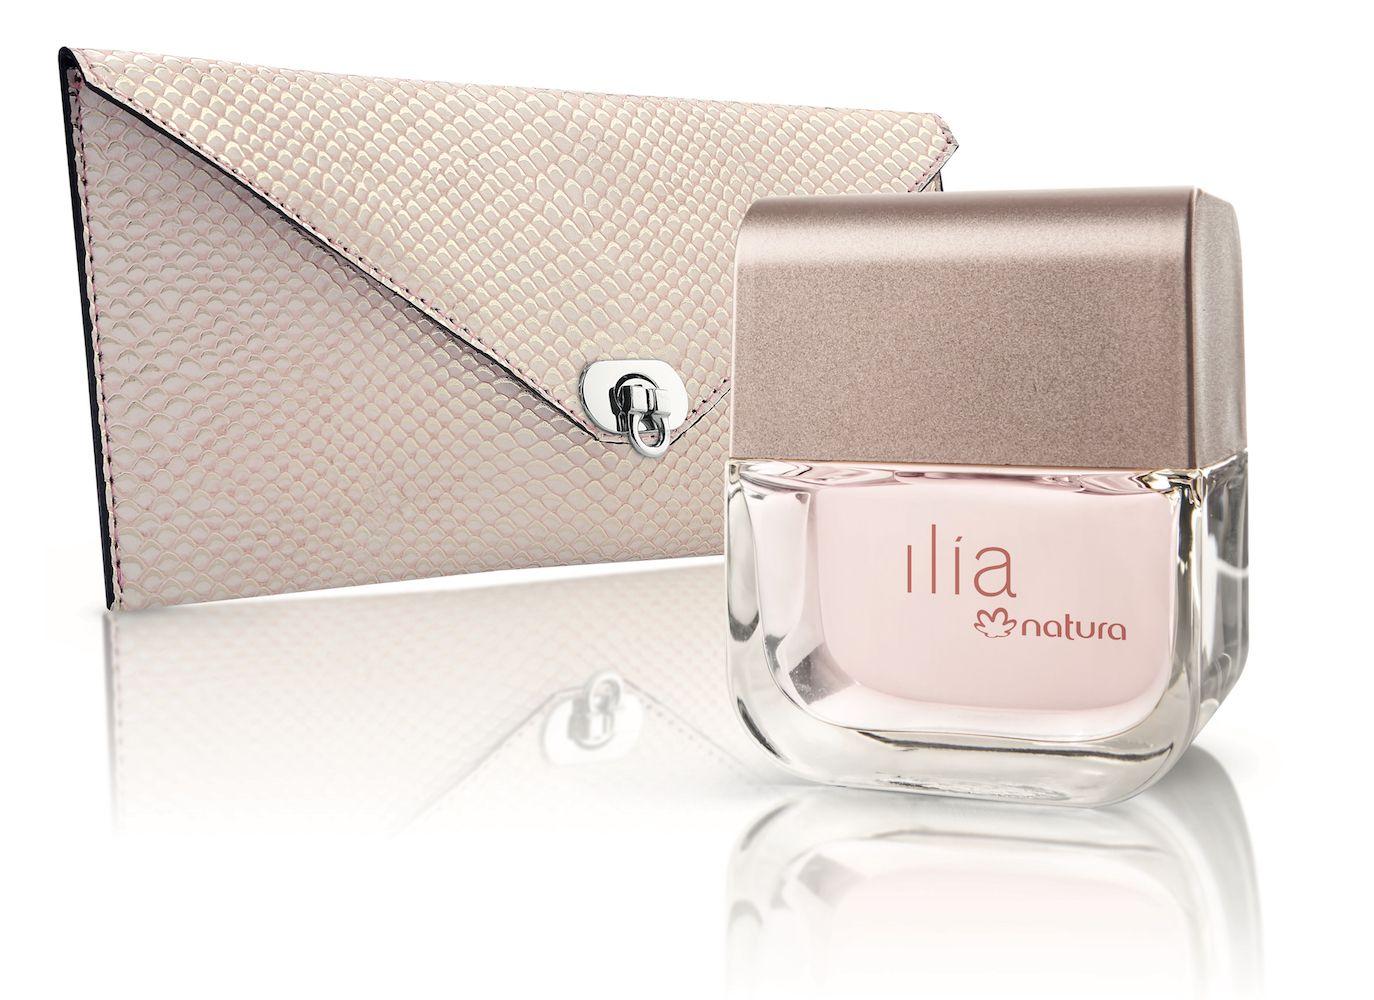 Perfume Ilía - Natura